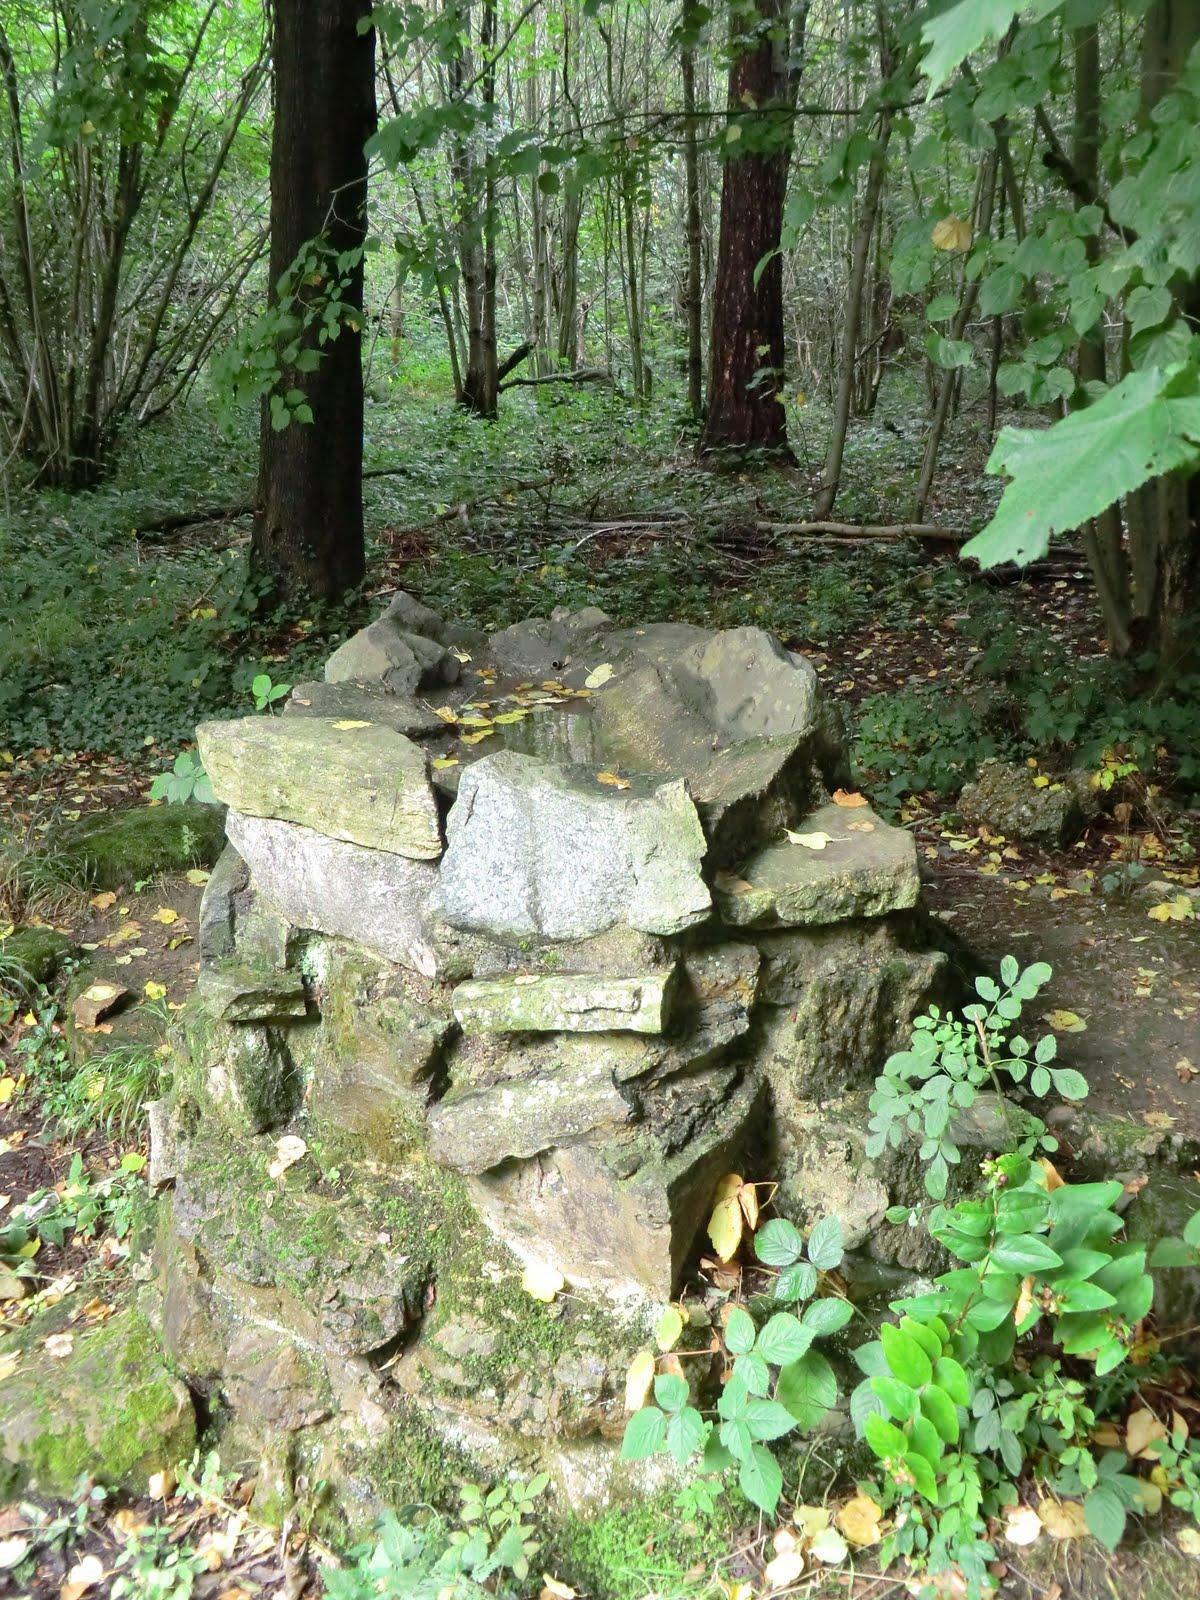 CIMG4287 Cairn, Selsdon Wood